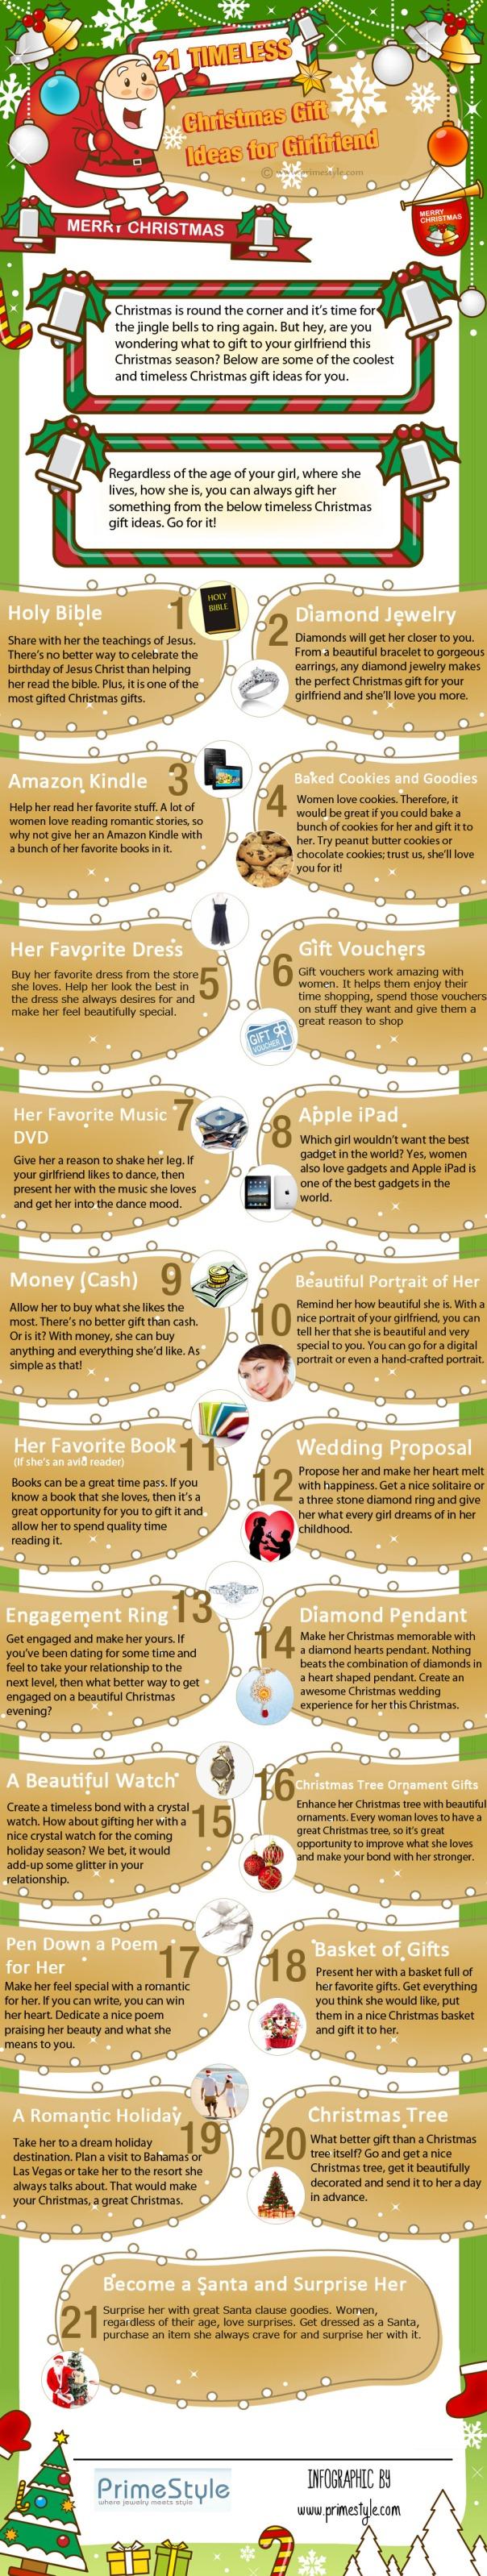 Top 5 Christmas Gift Ideas Infographics |